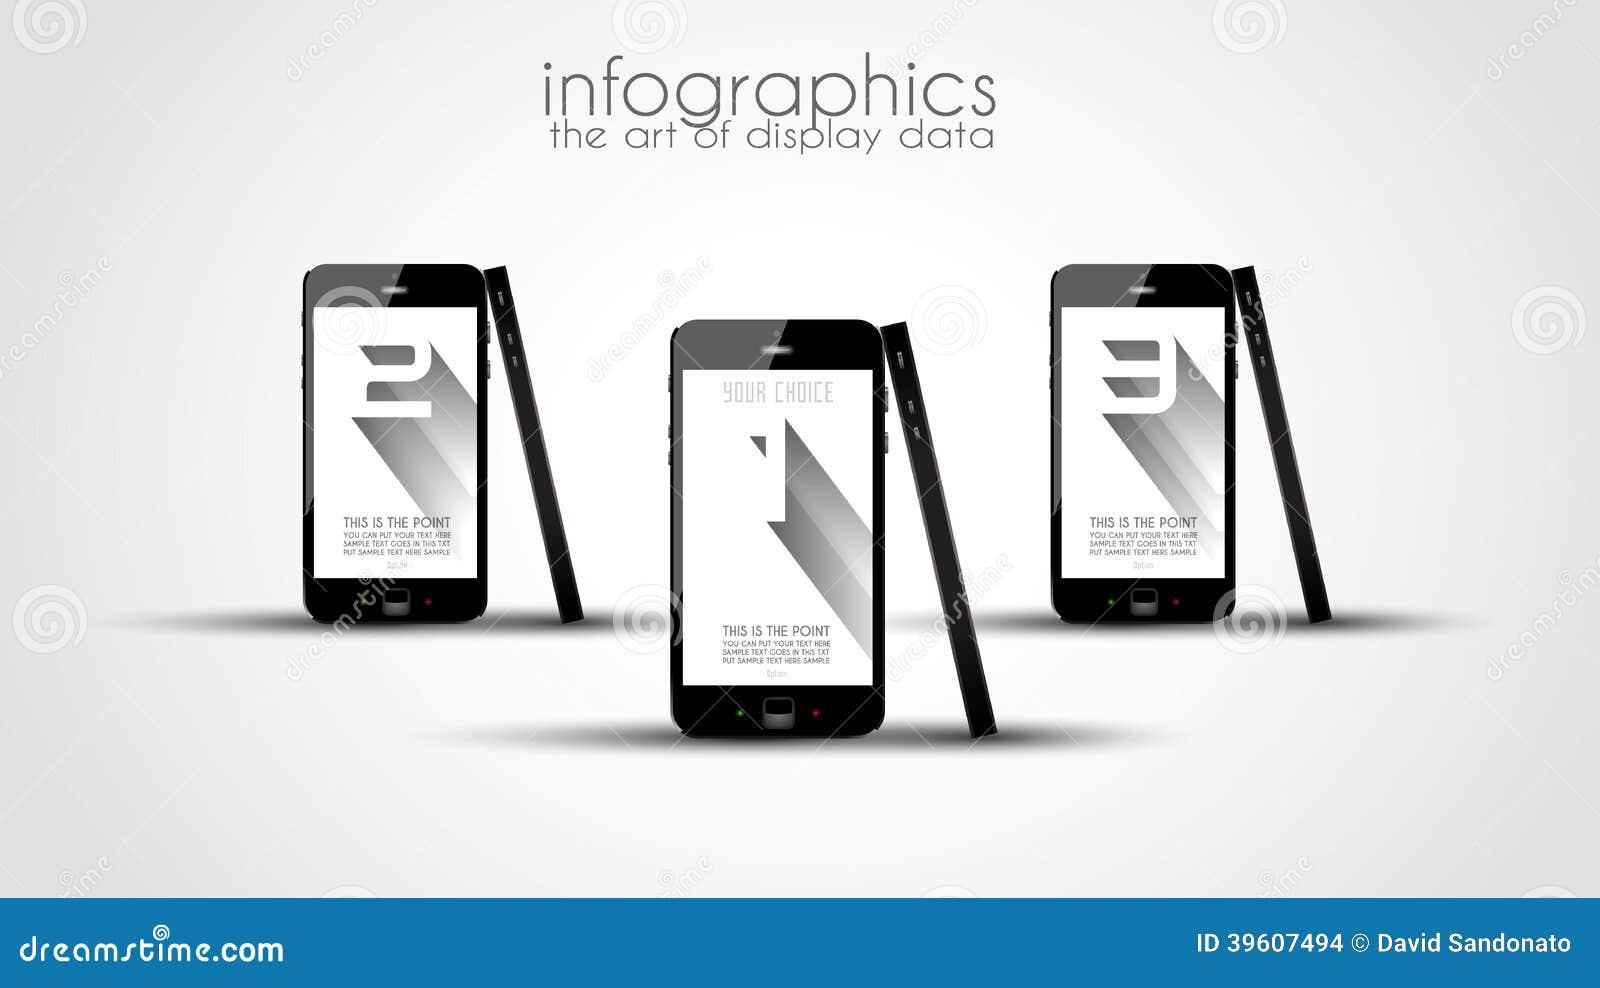 original style infographics templates stock vector image 39607494. Black Bedroom Furniture Sets. Home Design Ideas